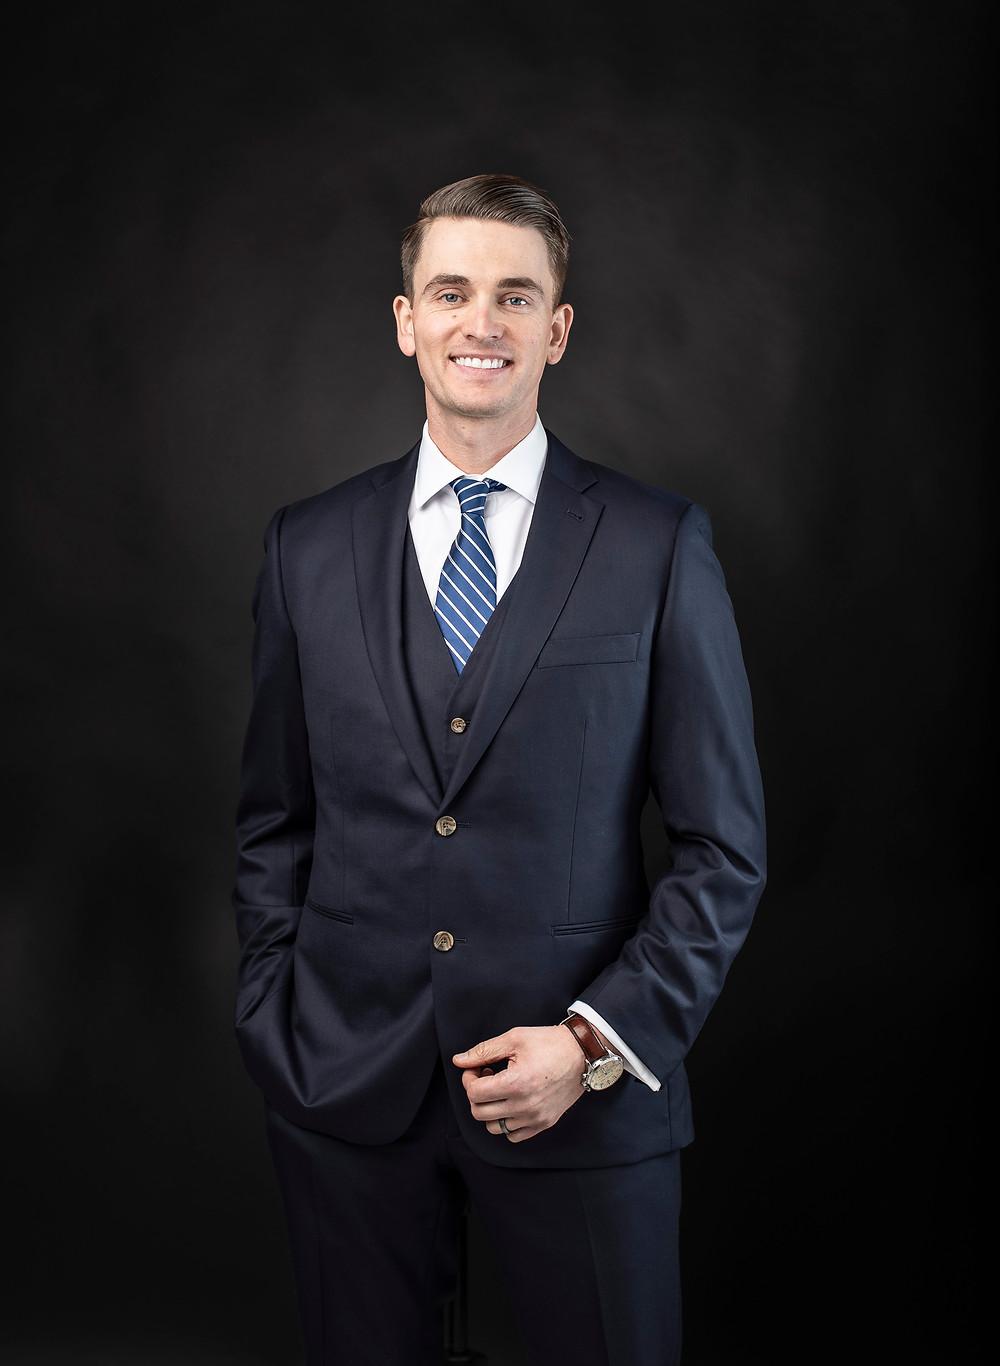 business portrait of a male senior vice president